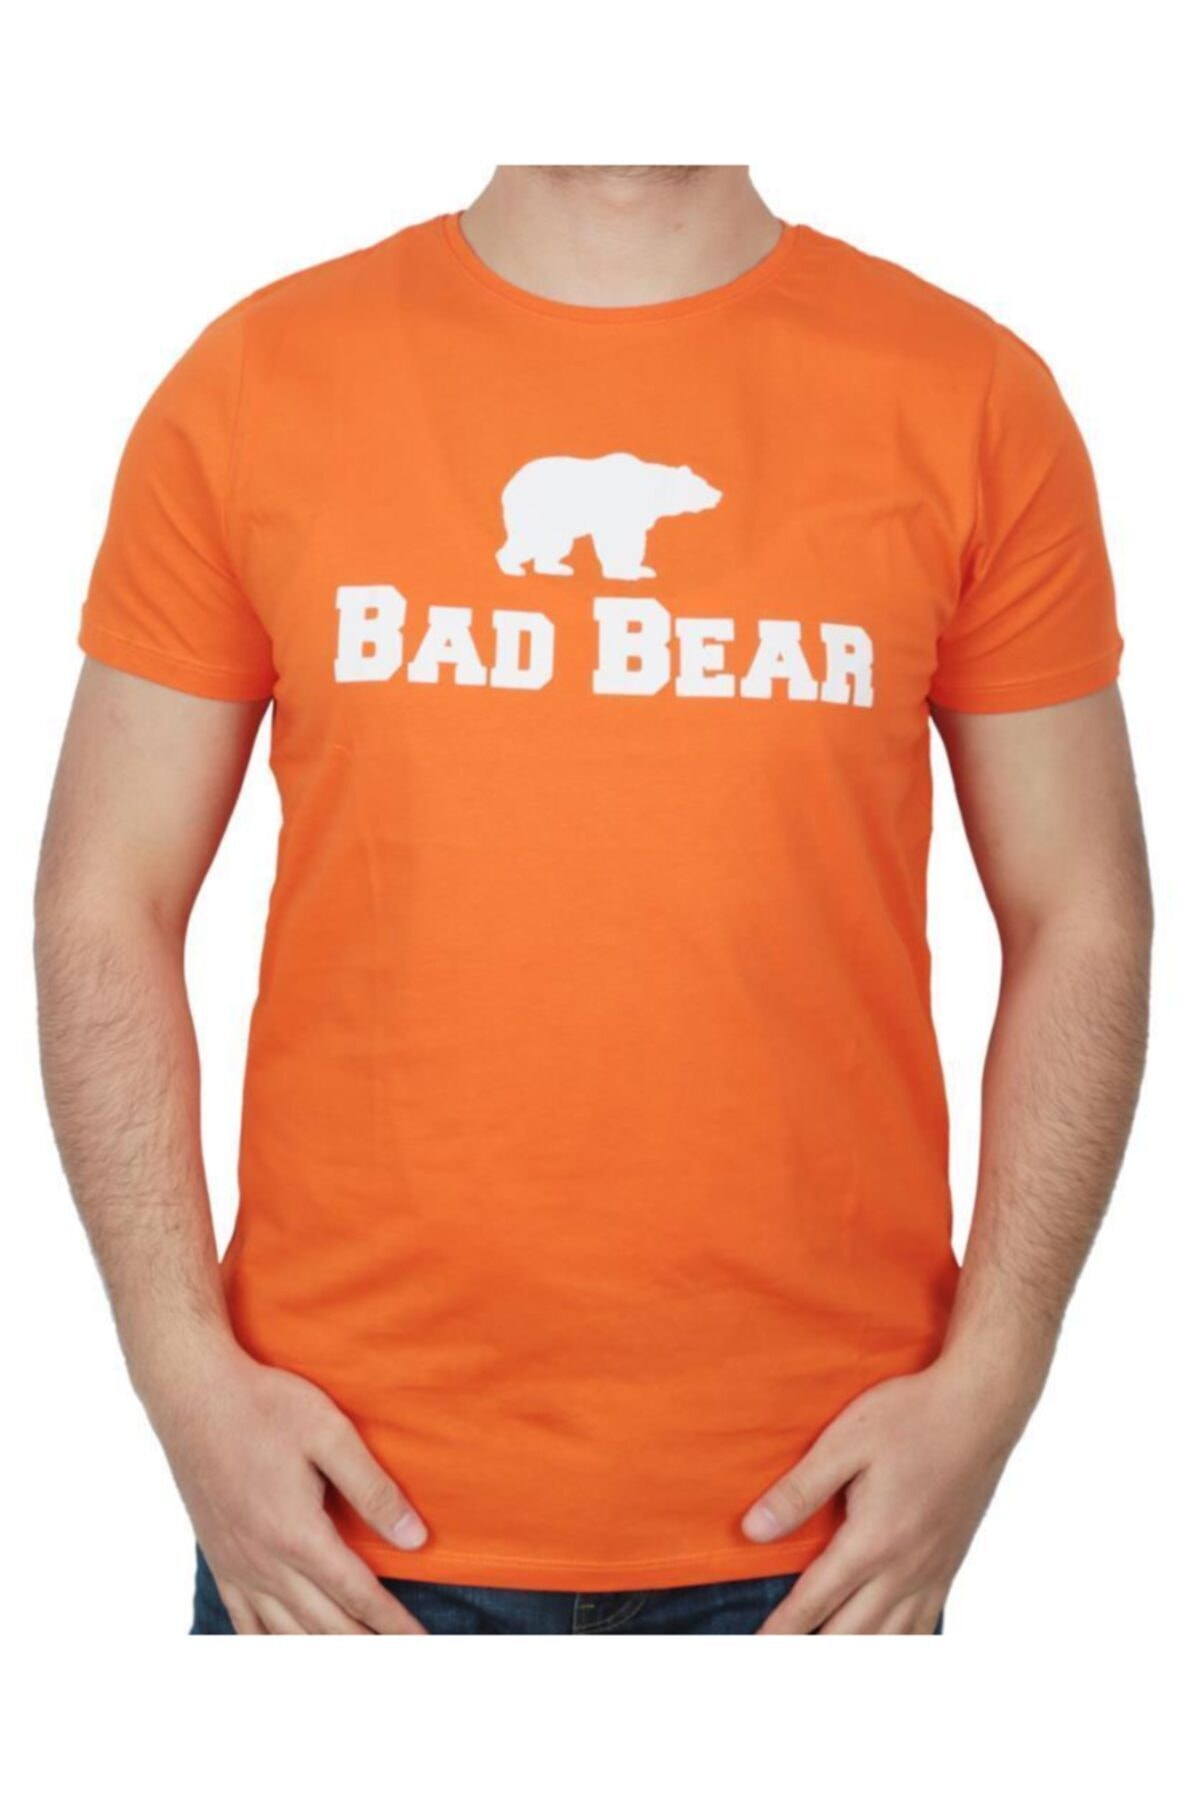 Bad Bear Erkek Turuncu Baskılı T-shirt 19.01.07.002 1